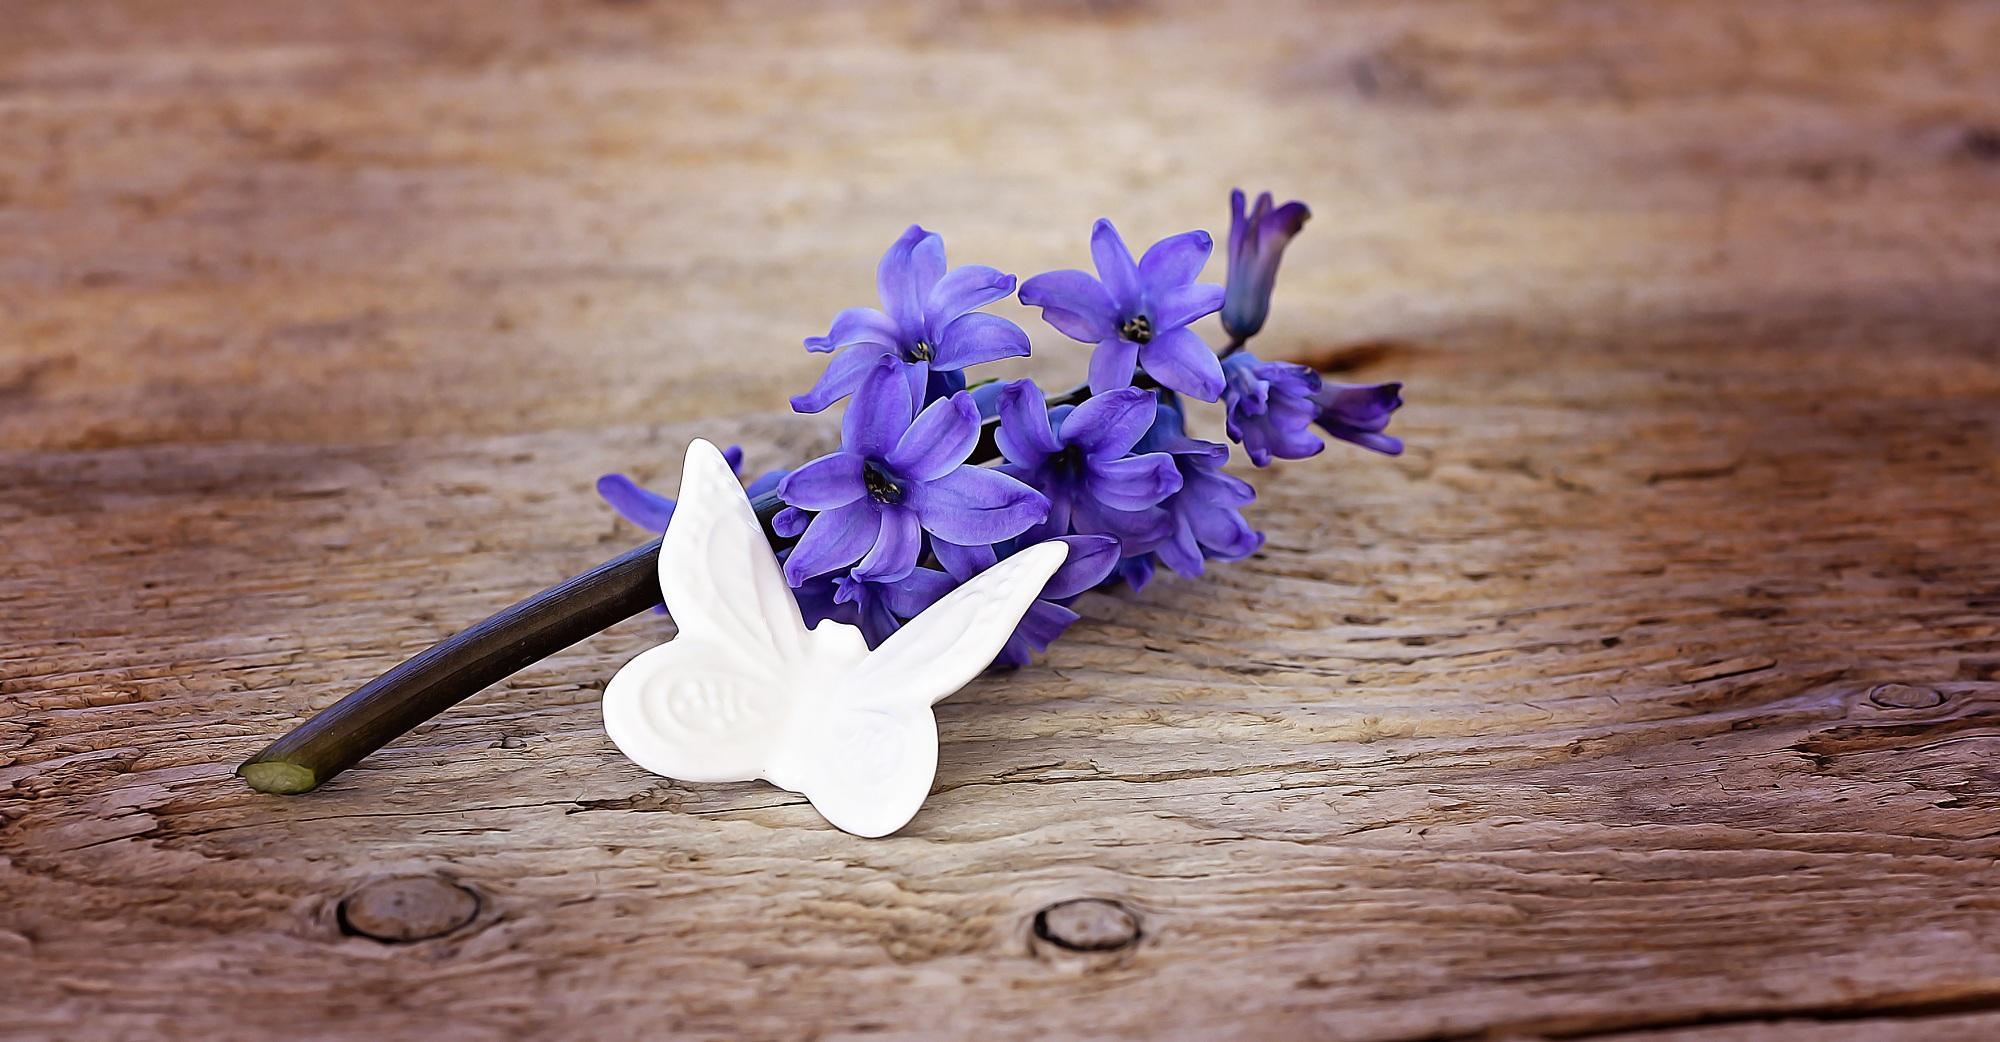 Free Images : wood, leaf, purple, petal, flora, blue flower, flowers ...